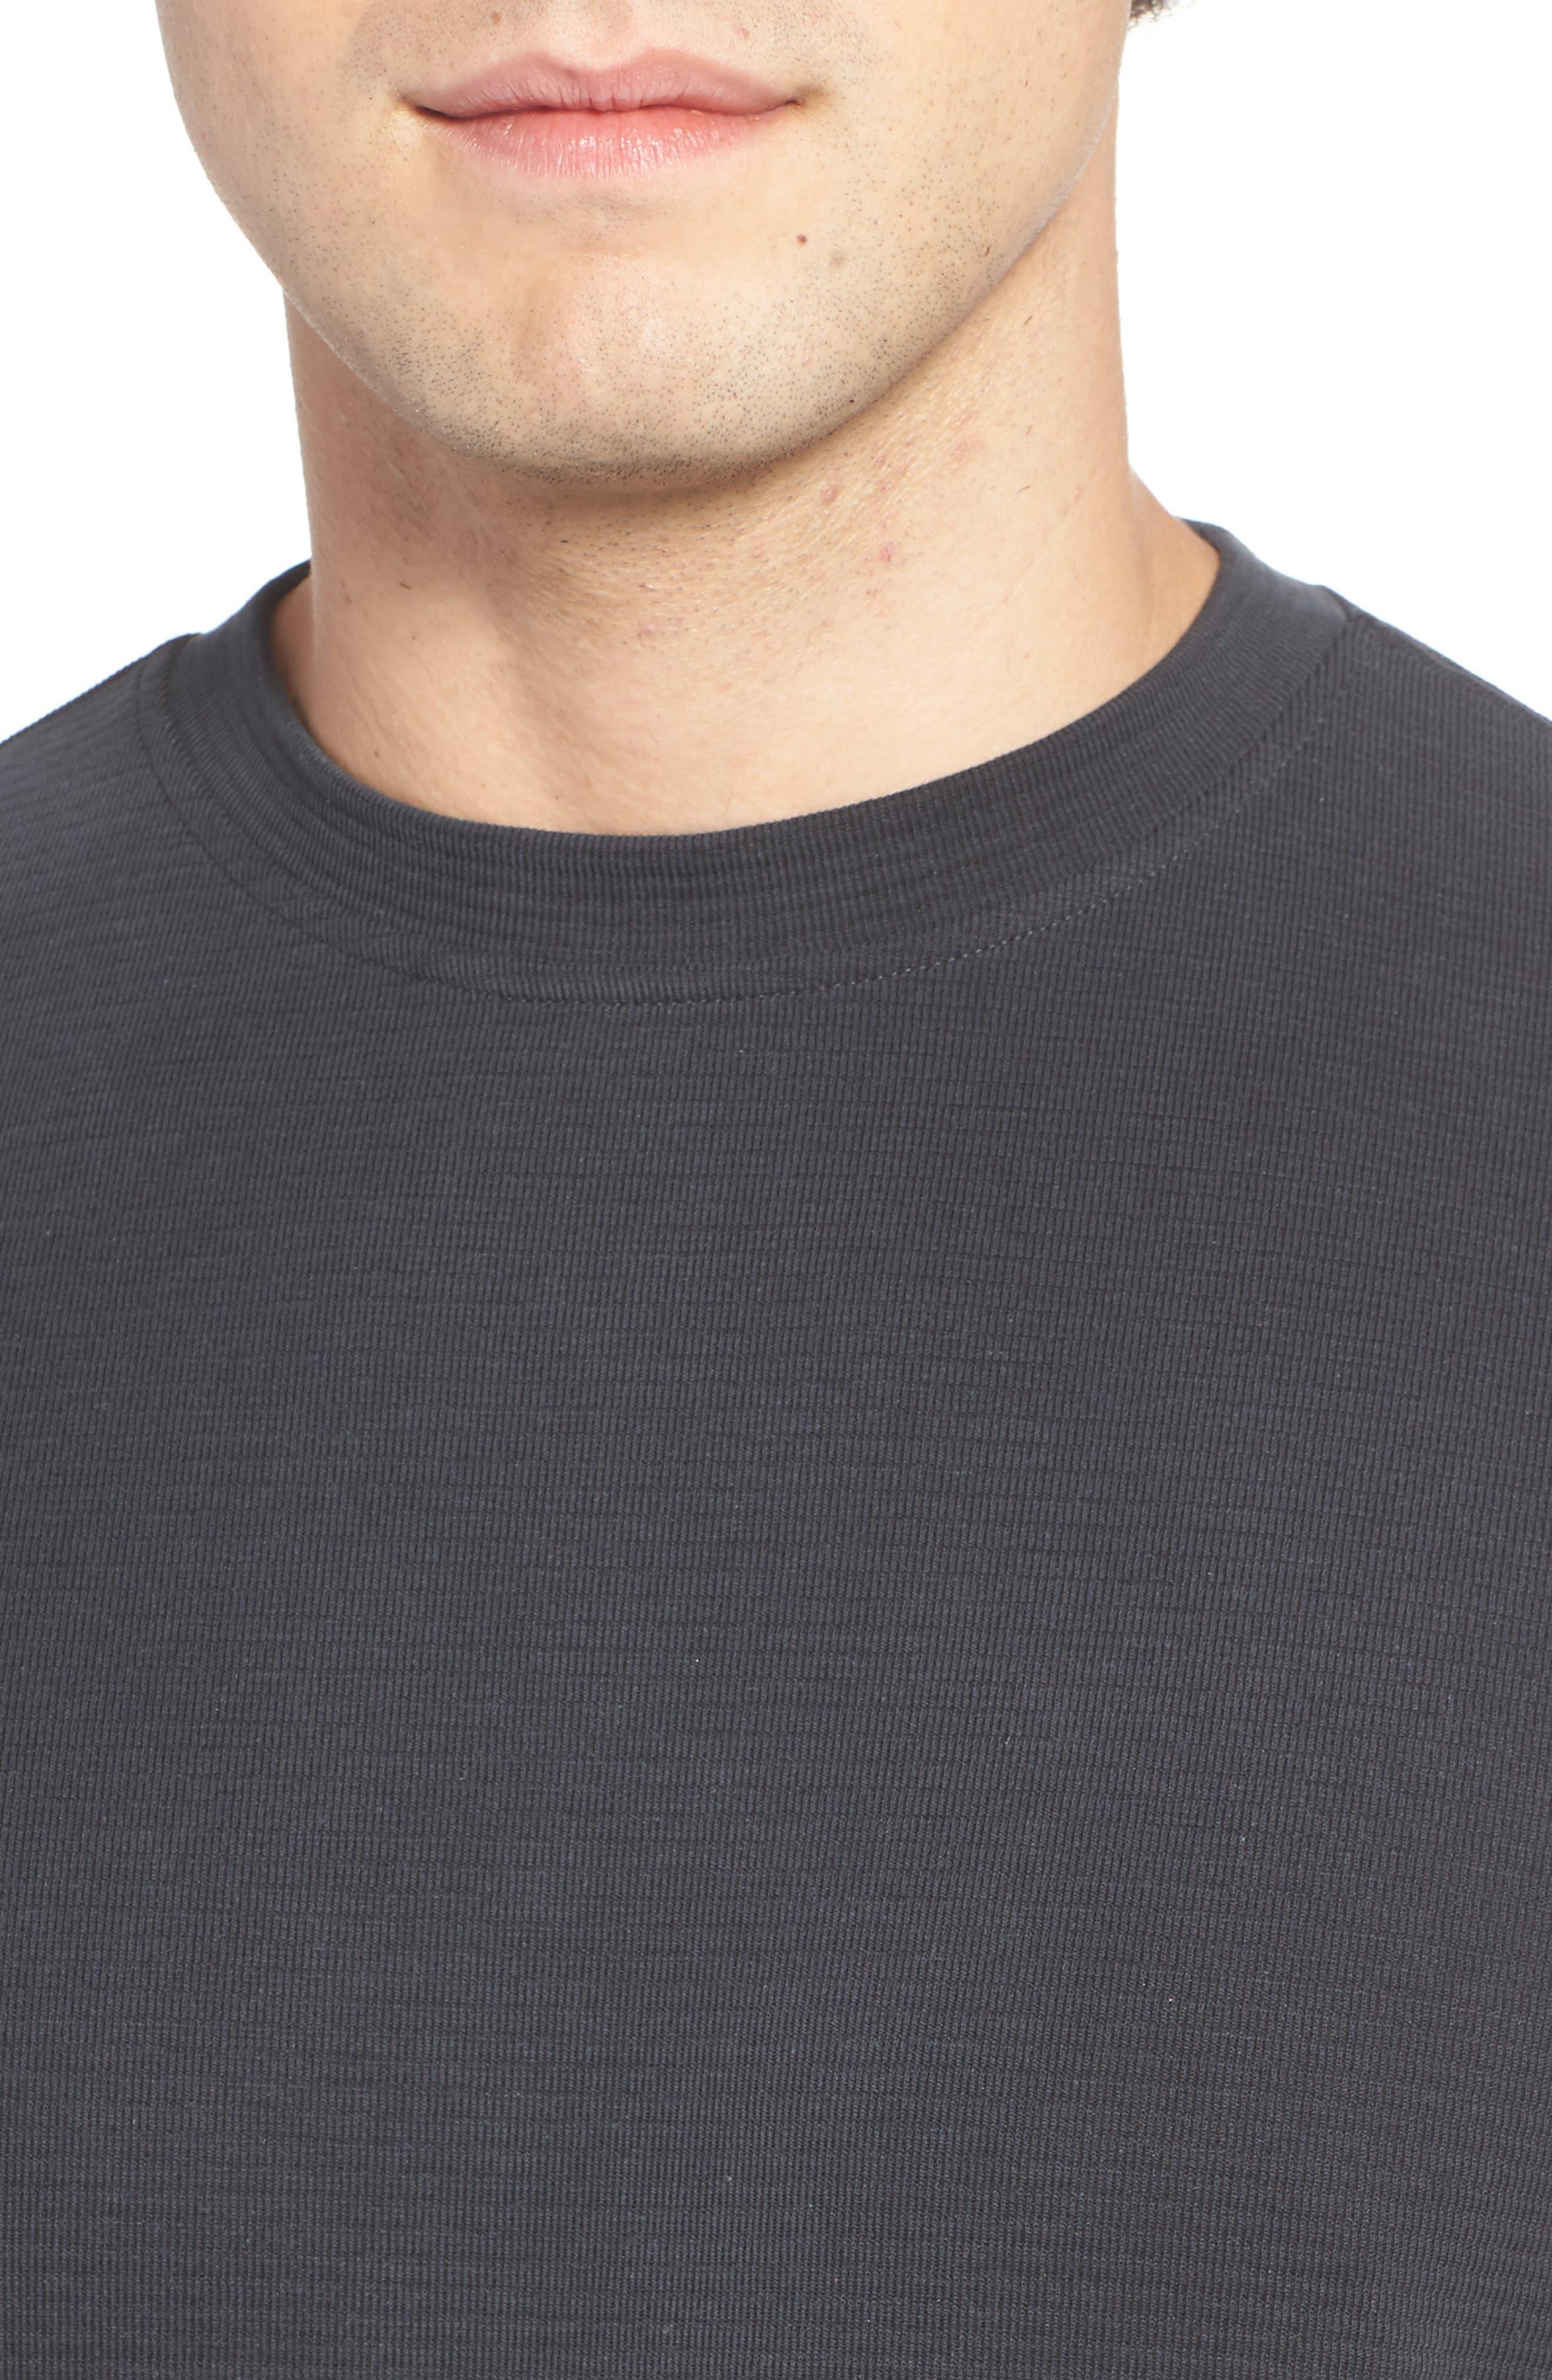 Crewneck T-Shirt,                             Alternate thumbnail 4, color,                             001